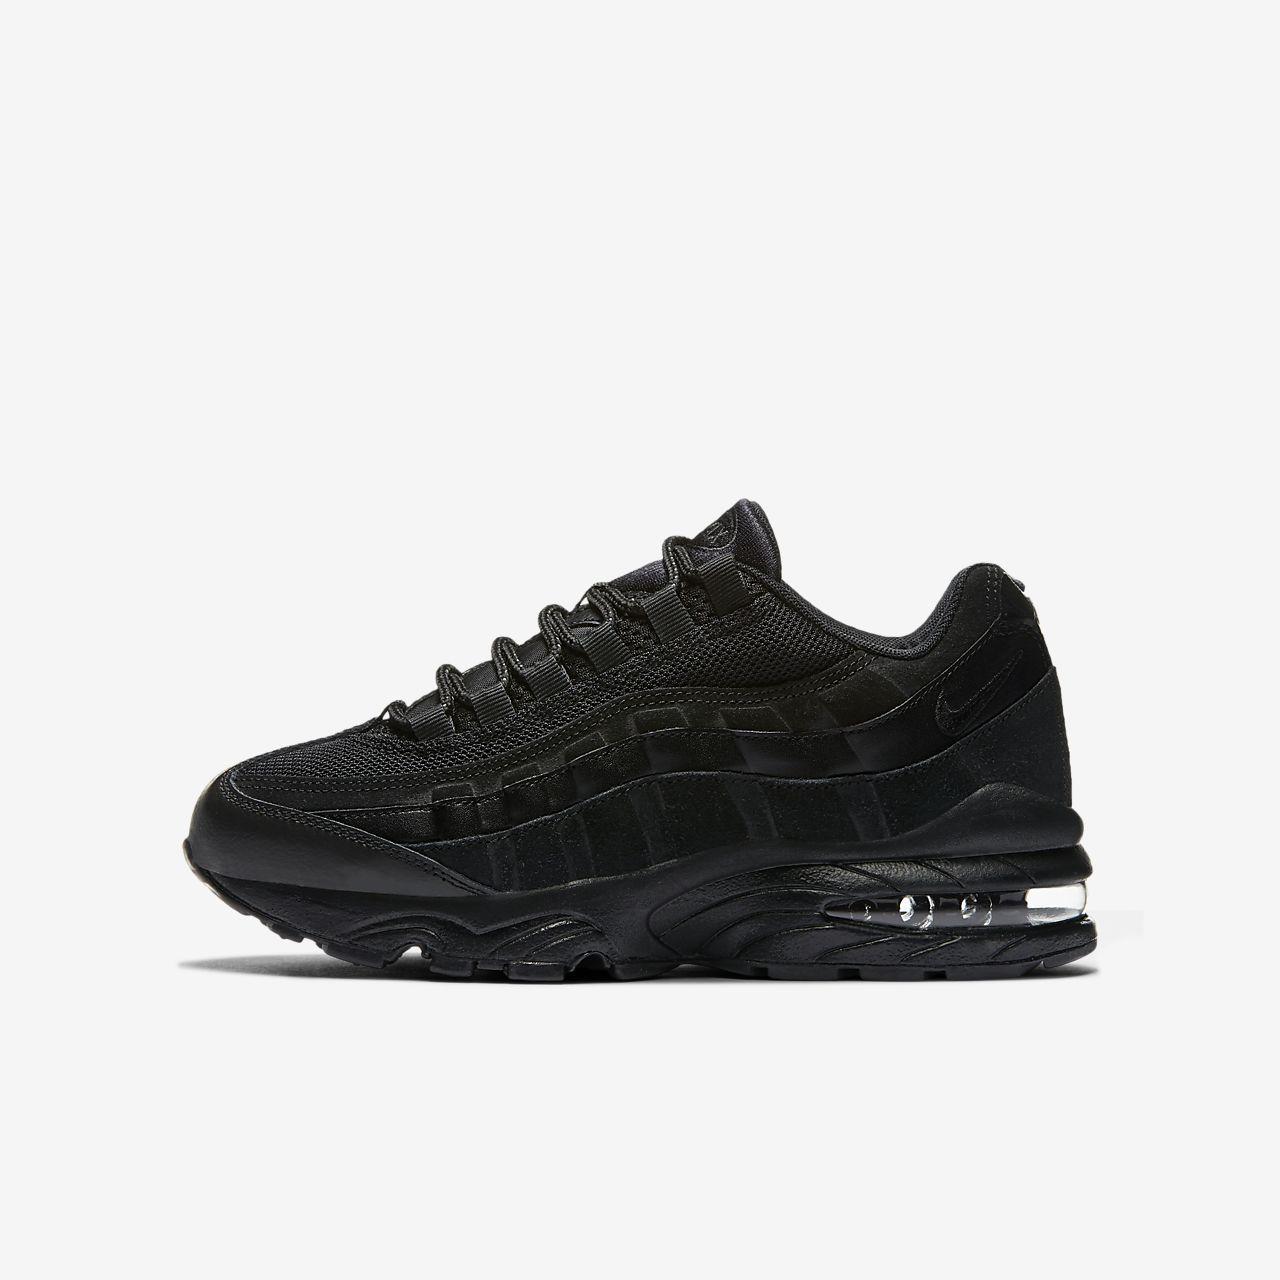 buy popular 1a30b 2c5c6 ... Nike Air Max 95 Older Kids Shoe